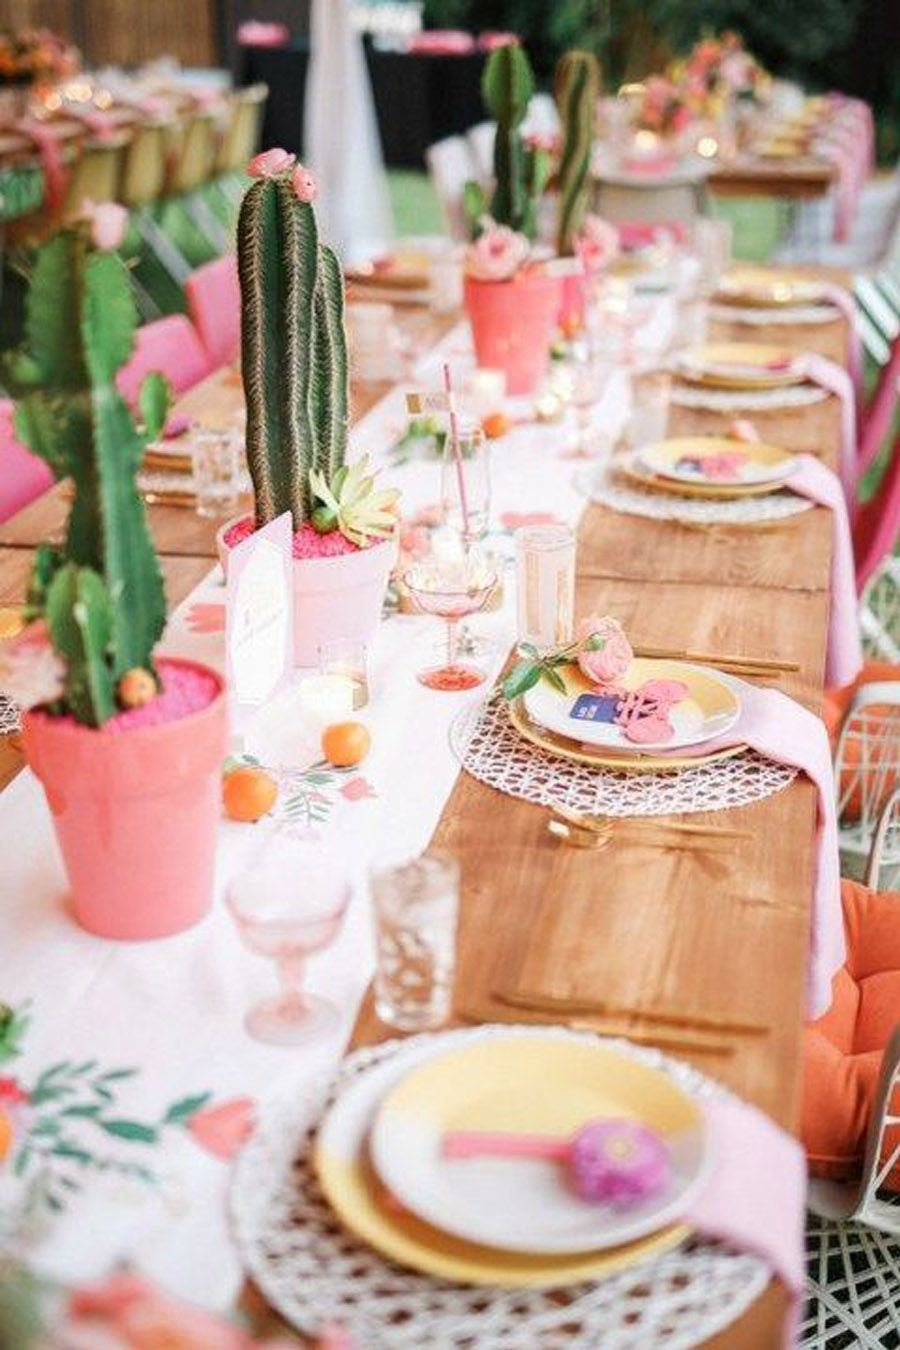 Inspiracin cactus pinterest te atreves tu boda y cactus nueva tendencia cactus para decorar tu boda te atreves httpunabodaoriginalblogdonde como y cuandodecoracion inspiracion cactus altavistaventures Image collections